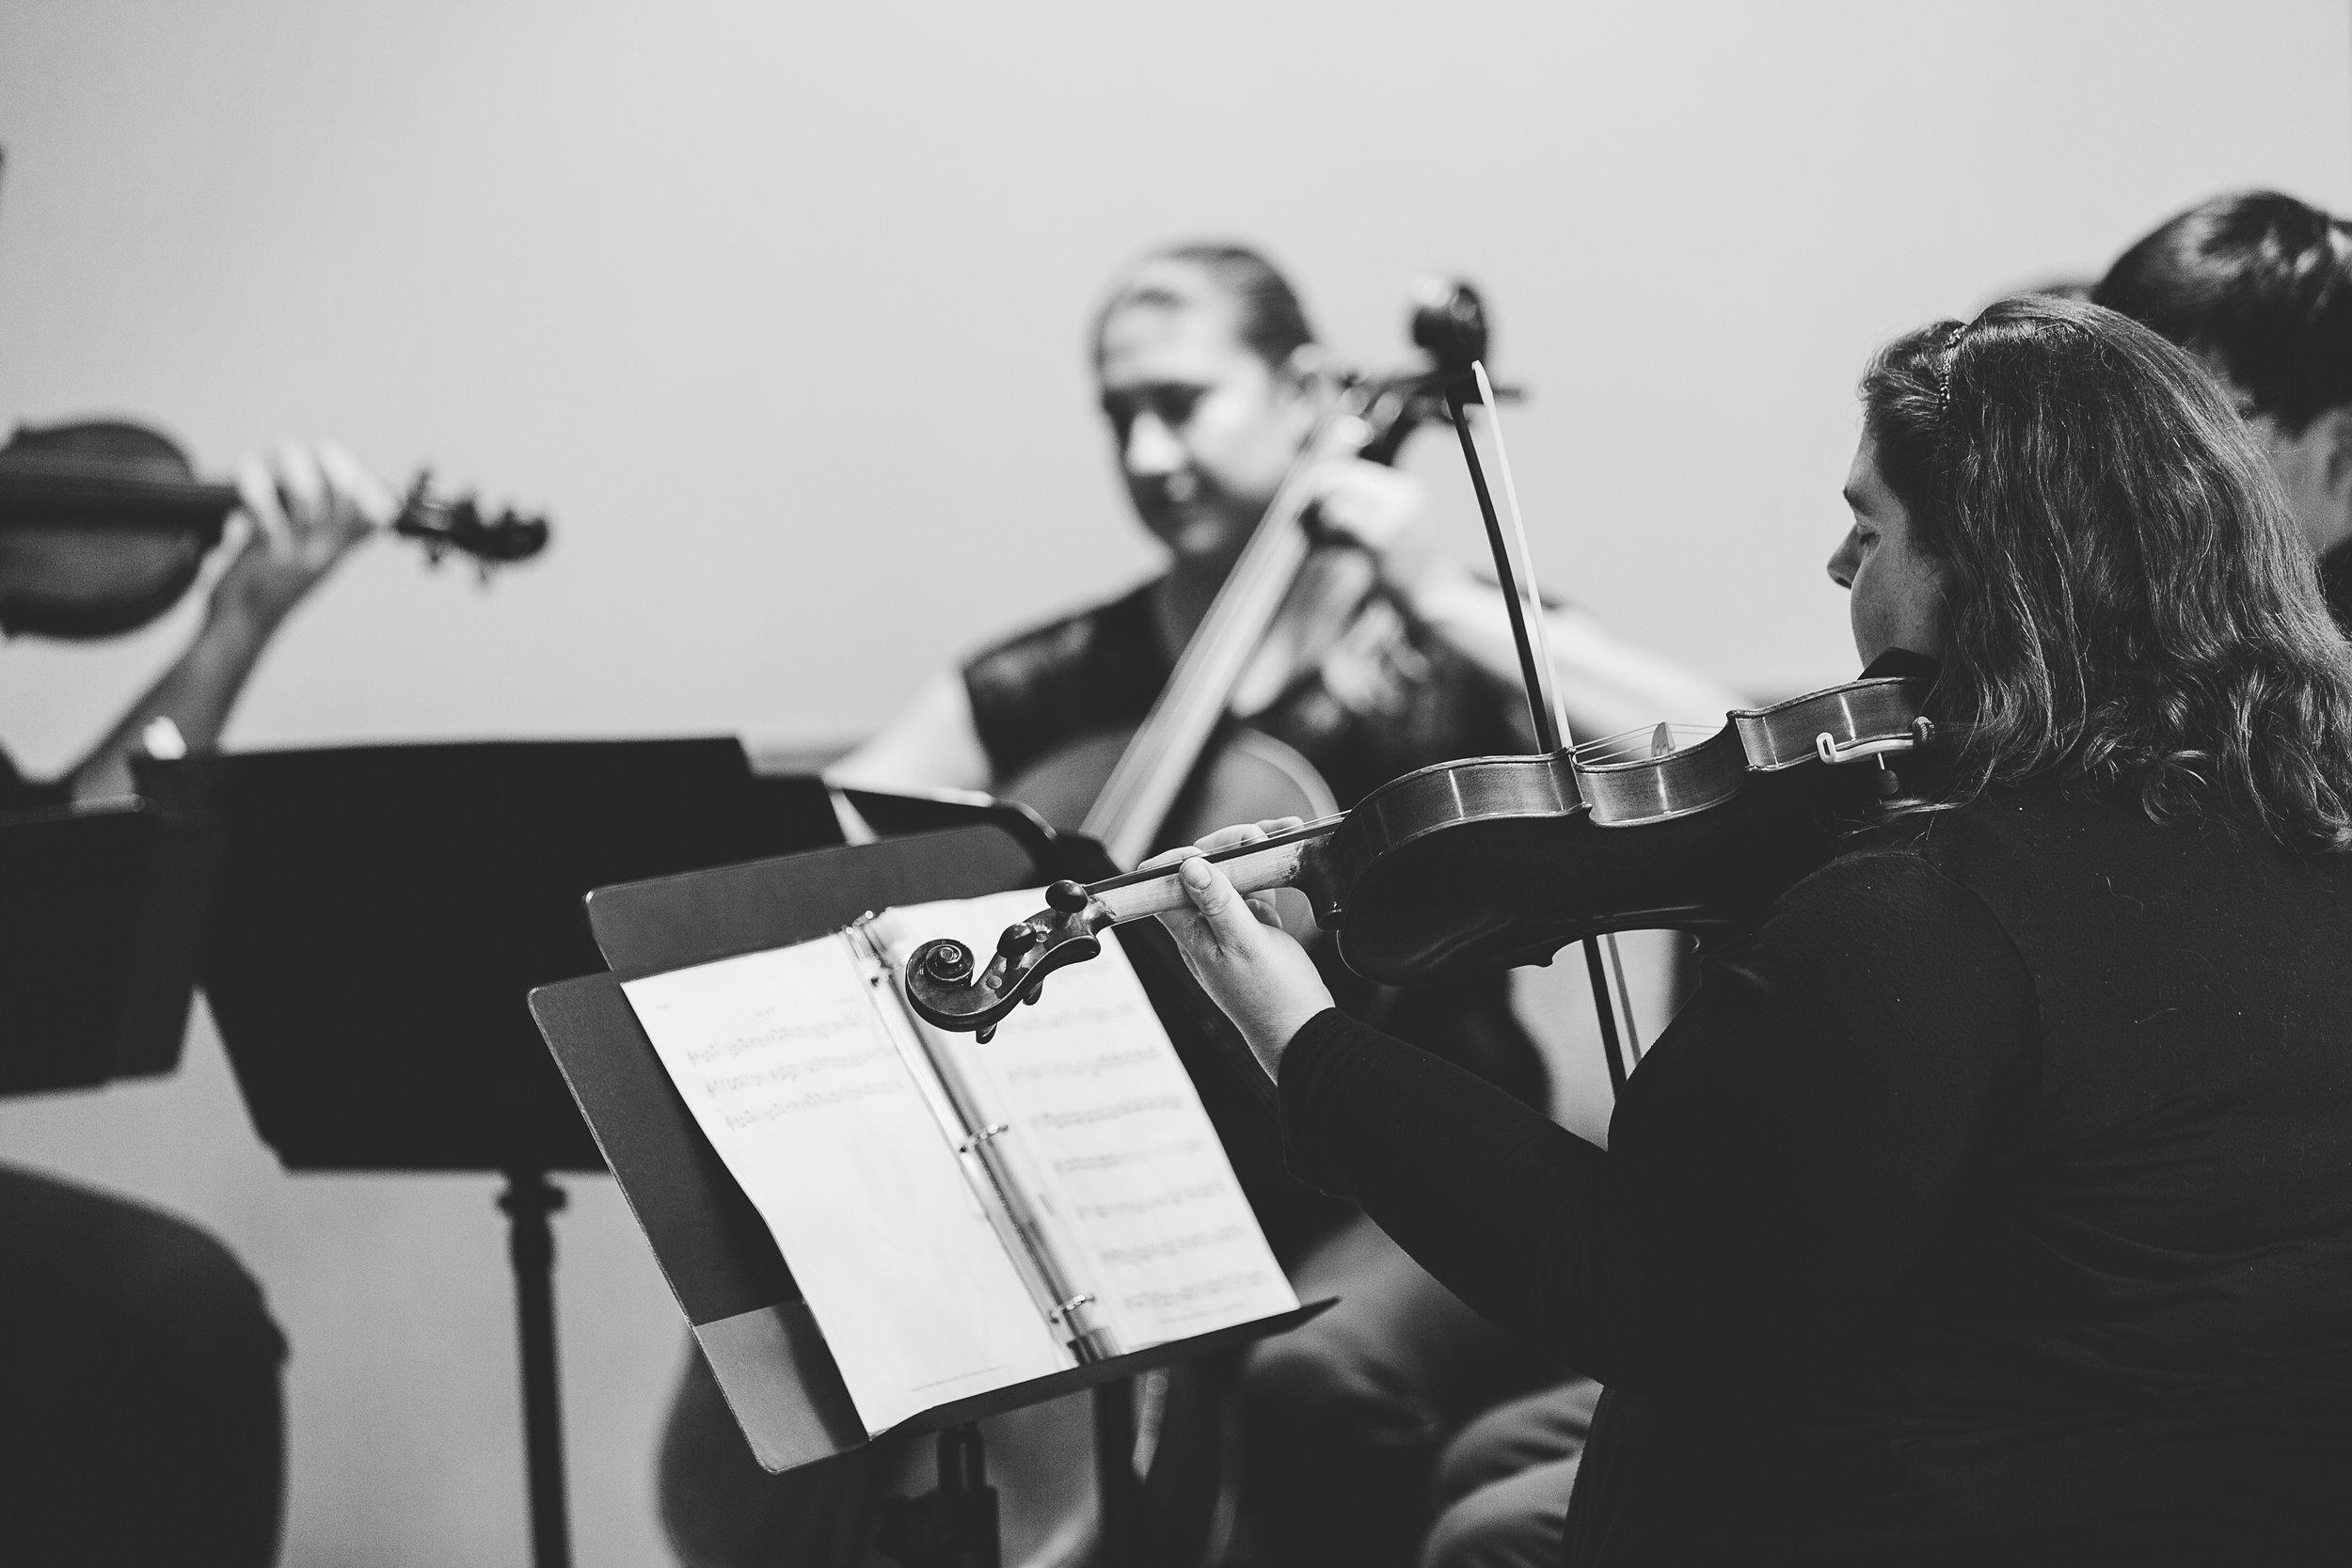 AVIVA Strings: Elegant LiveStringsFor Weddings, Events, &Special Occasions. ServingNortheastern Pennsylvania,Wilkes-Barre, Scranton, the Poconos, the Lehigh Valley, Philadelphiaand beyond!